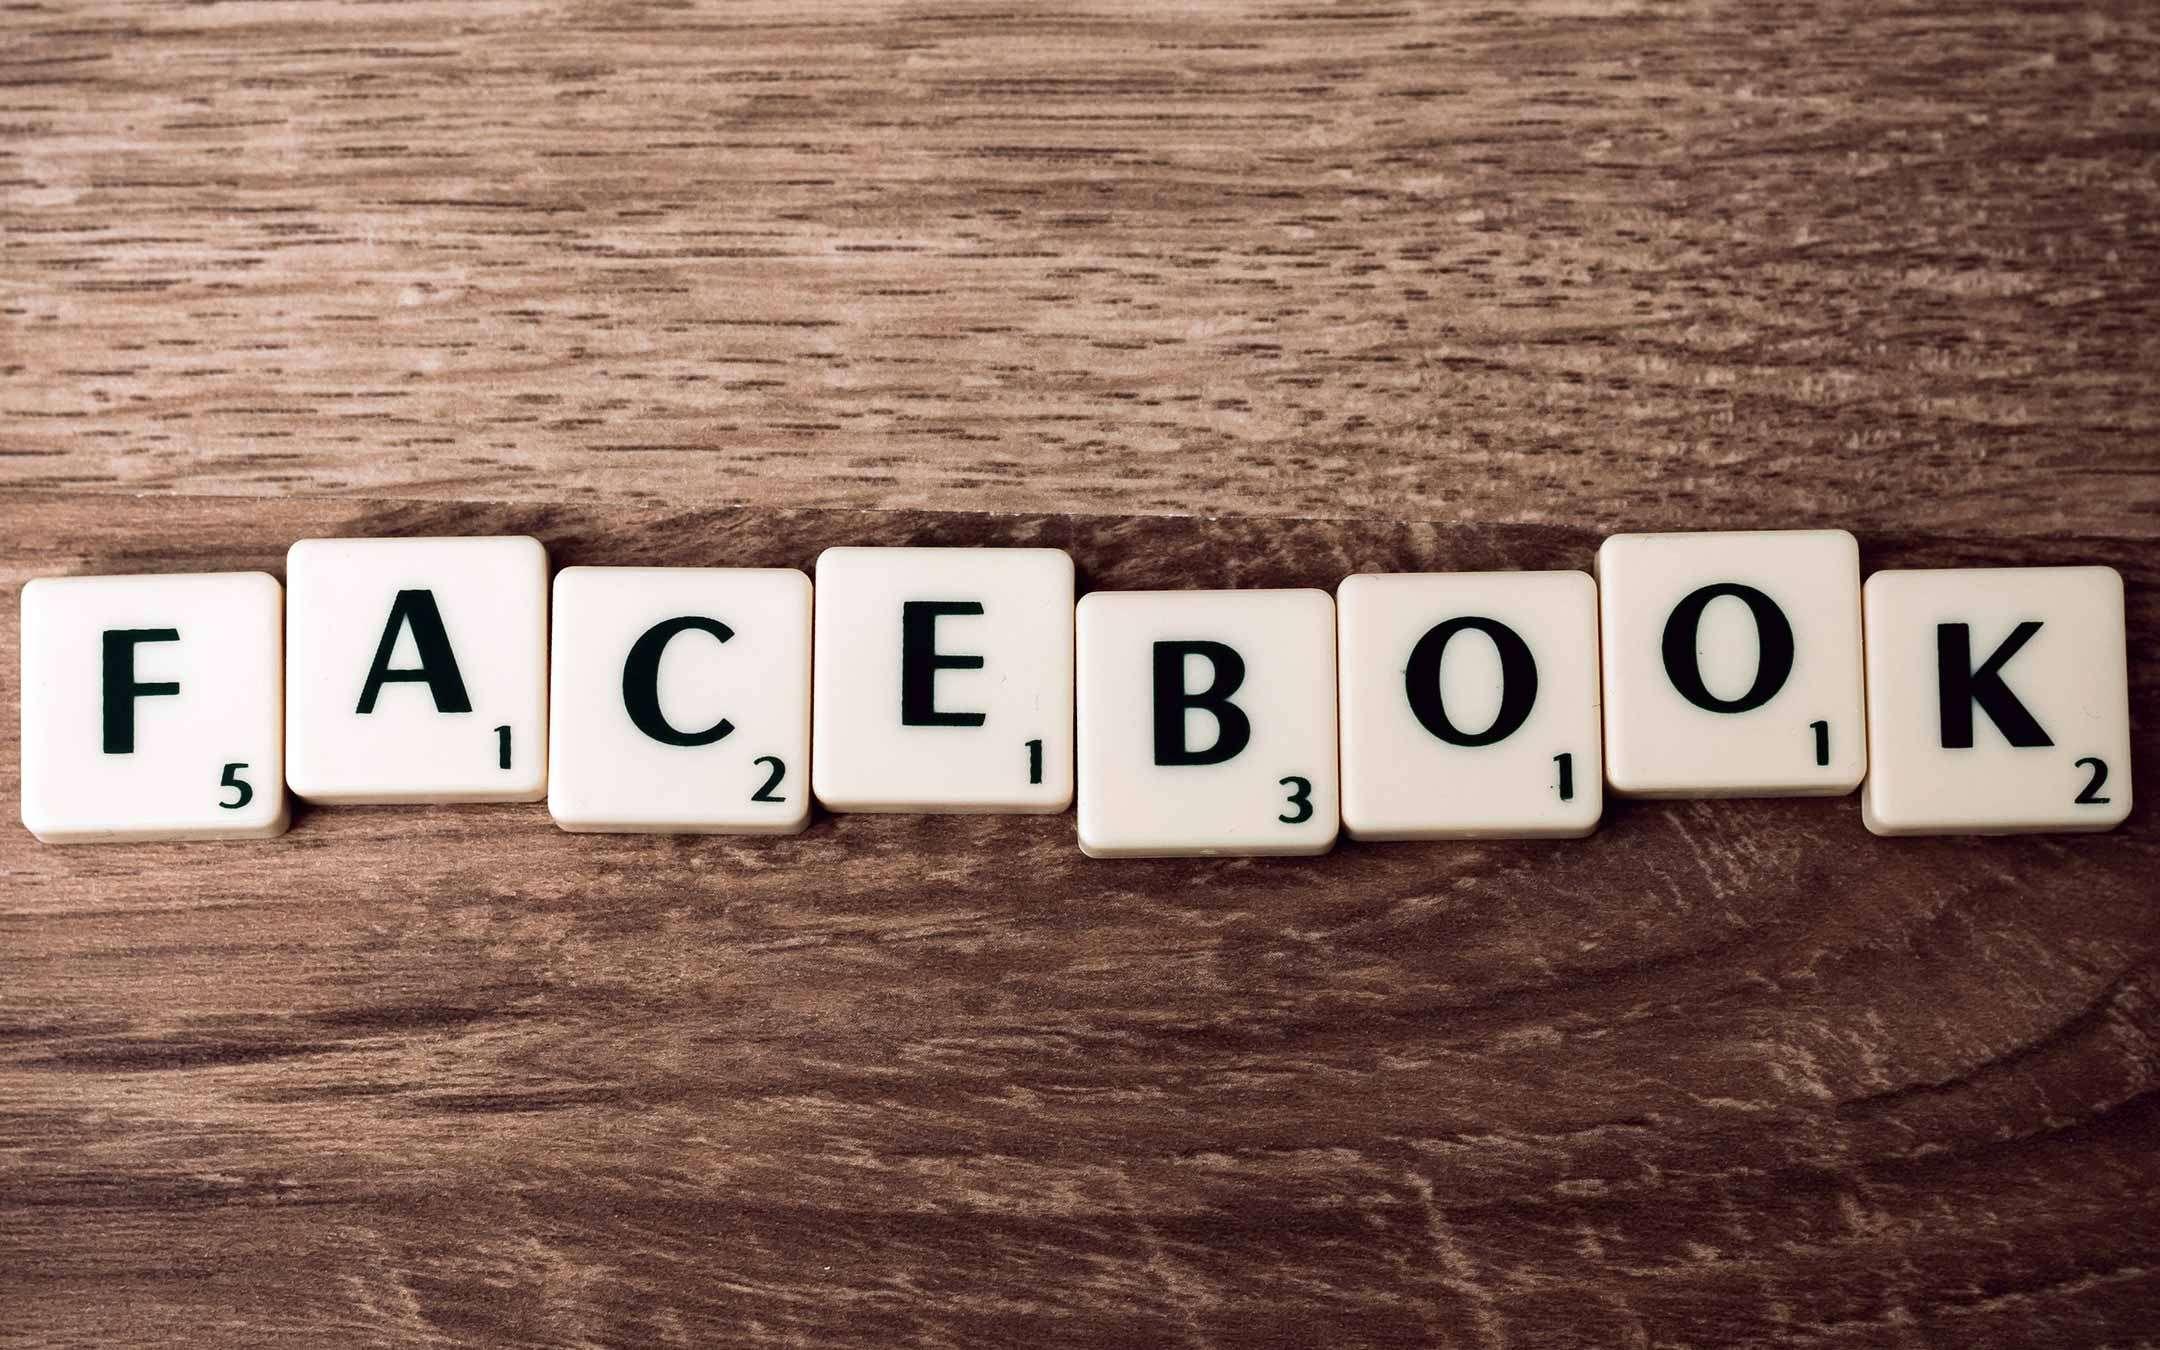 Facebook invests a billion dollars in news